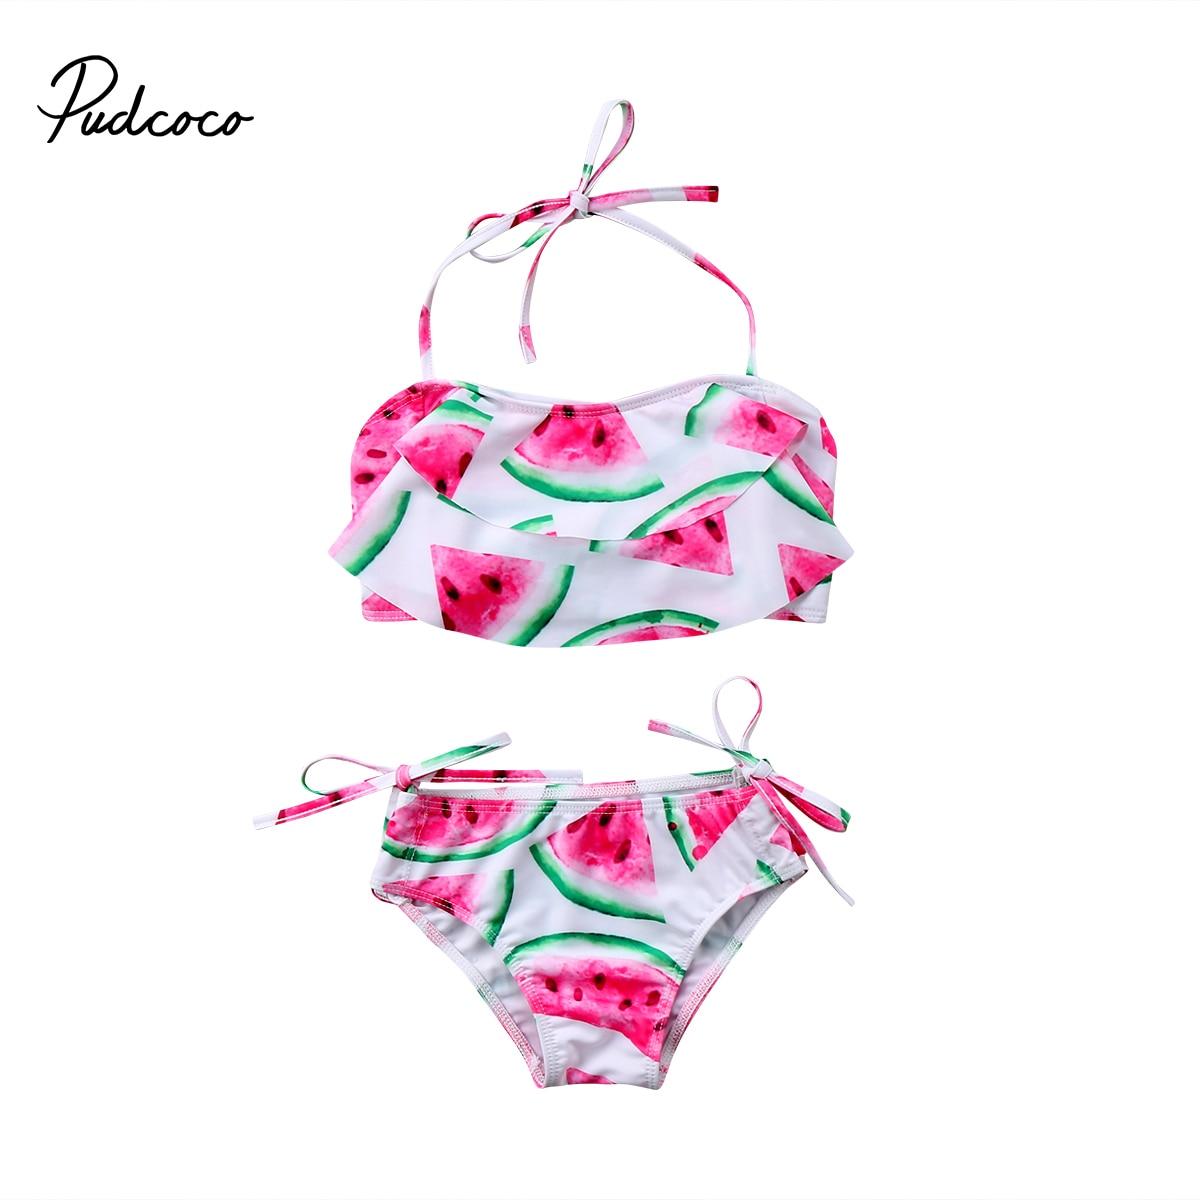 2PCS Baby Toddler Girls Swimwear Ruffle Bikini Set Swimsuits Kids Swimwear